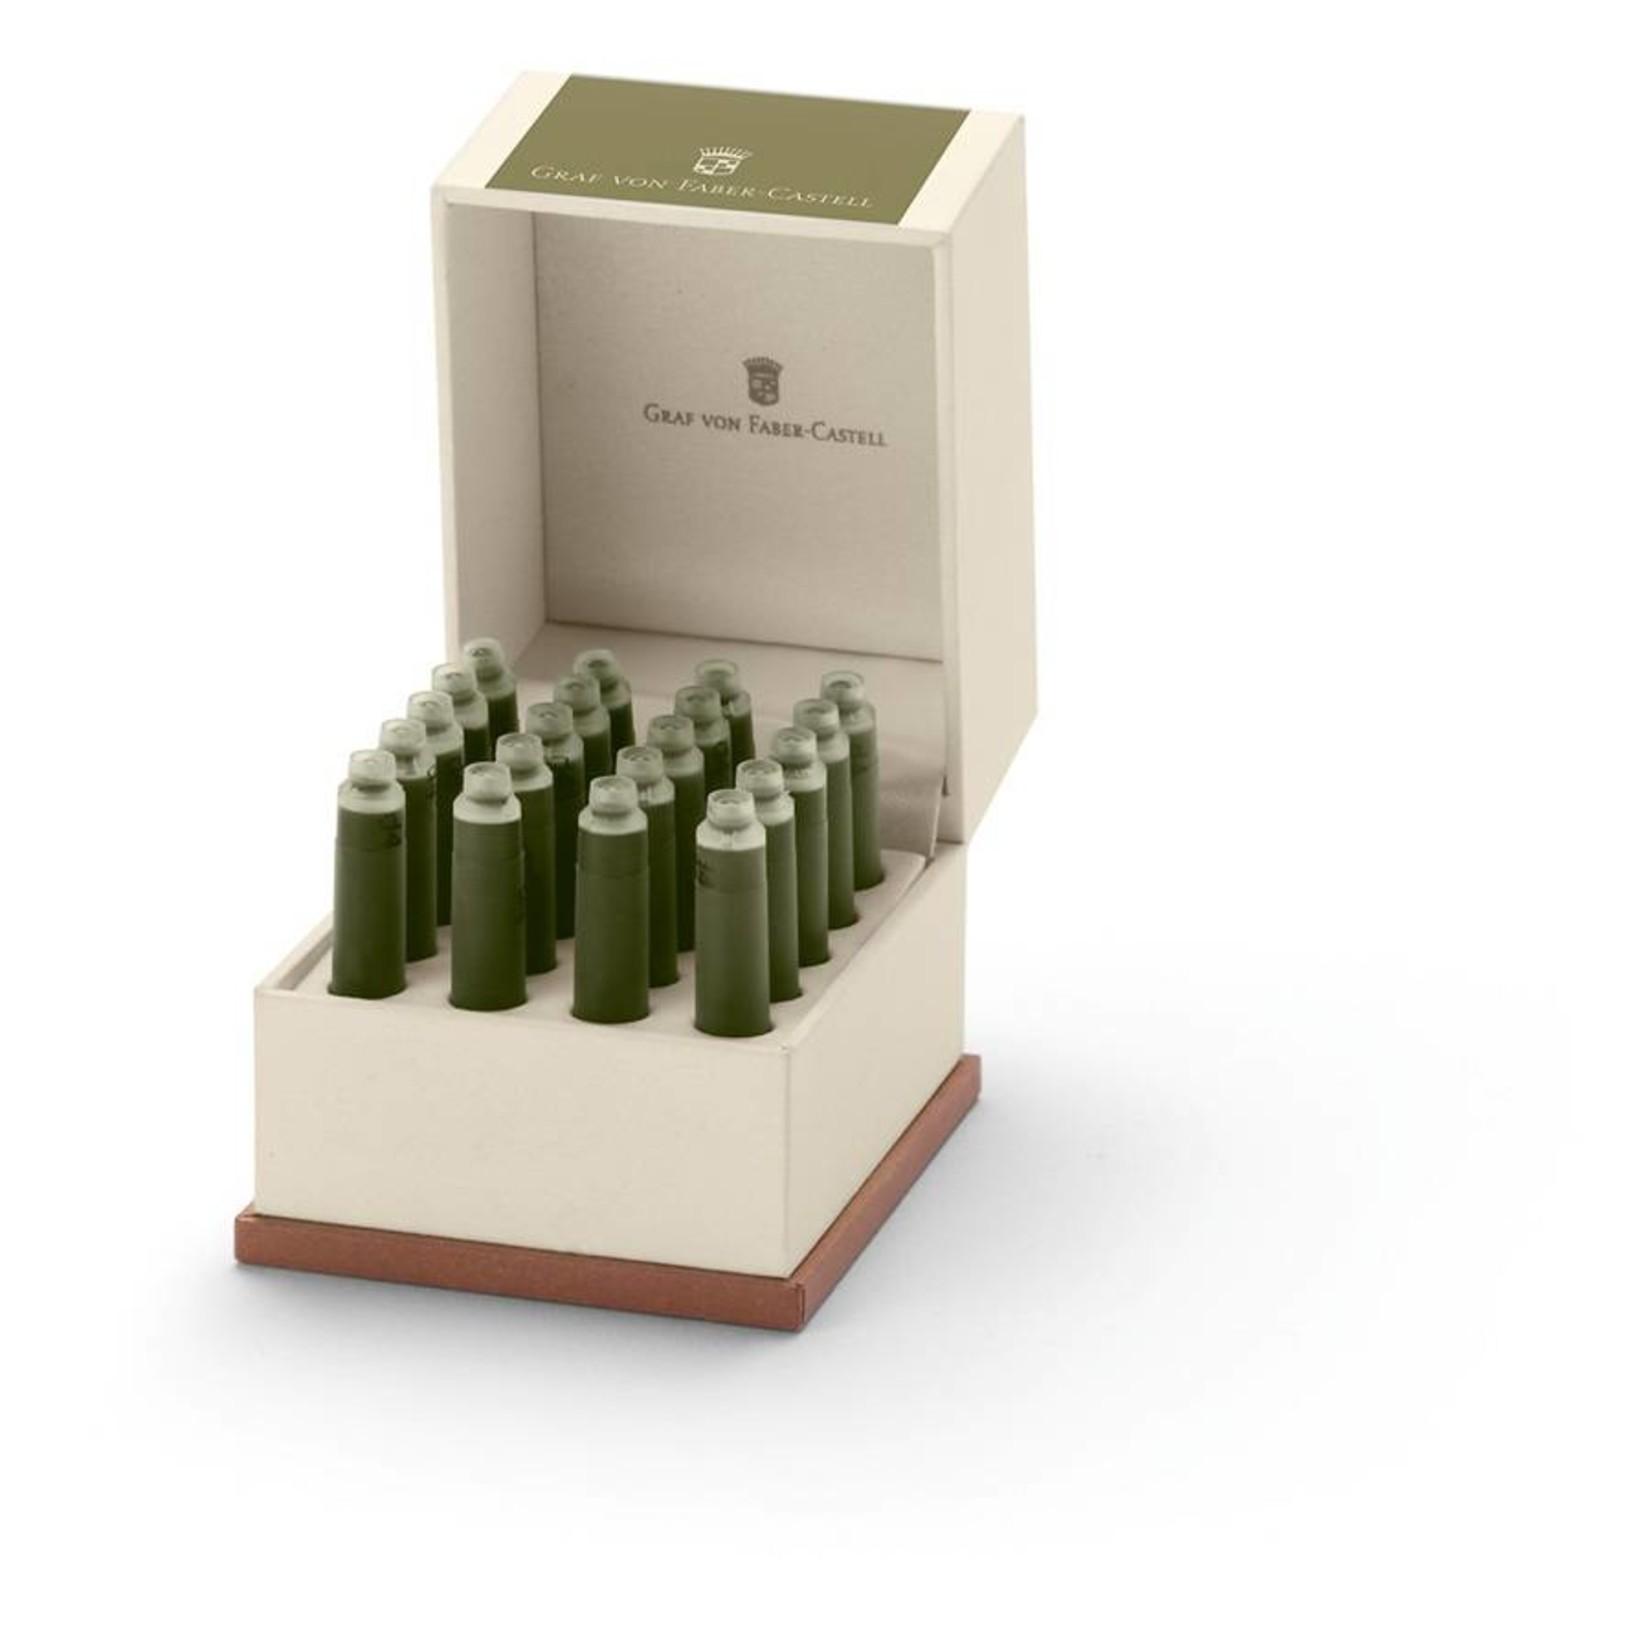 Faber-Castell Tintenpatronen Geschenkpackung Olive Green 20x